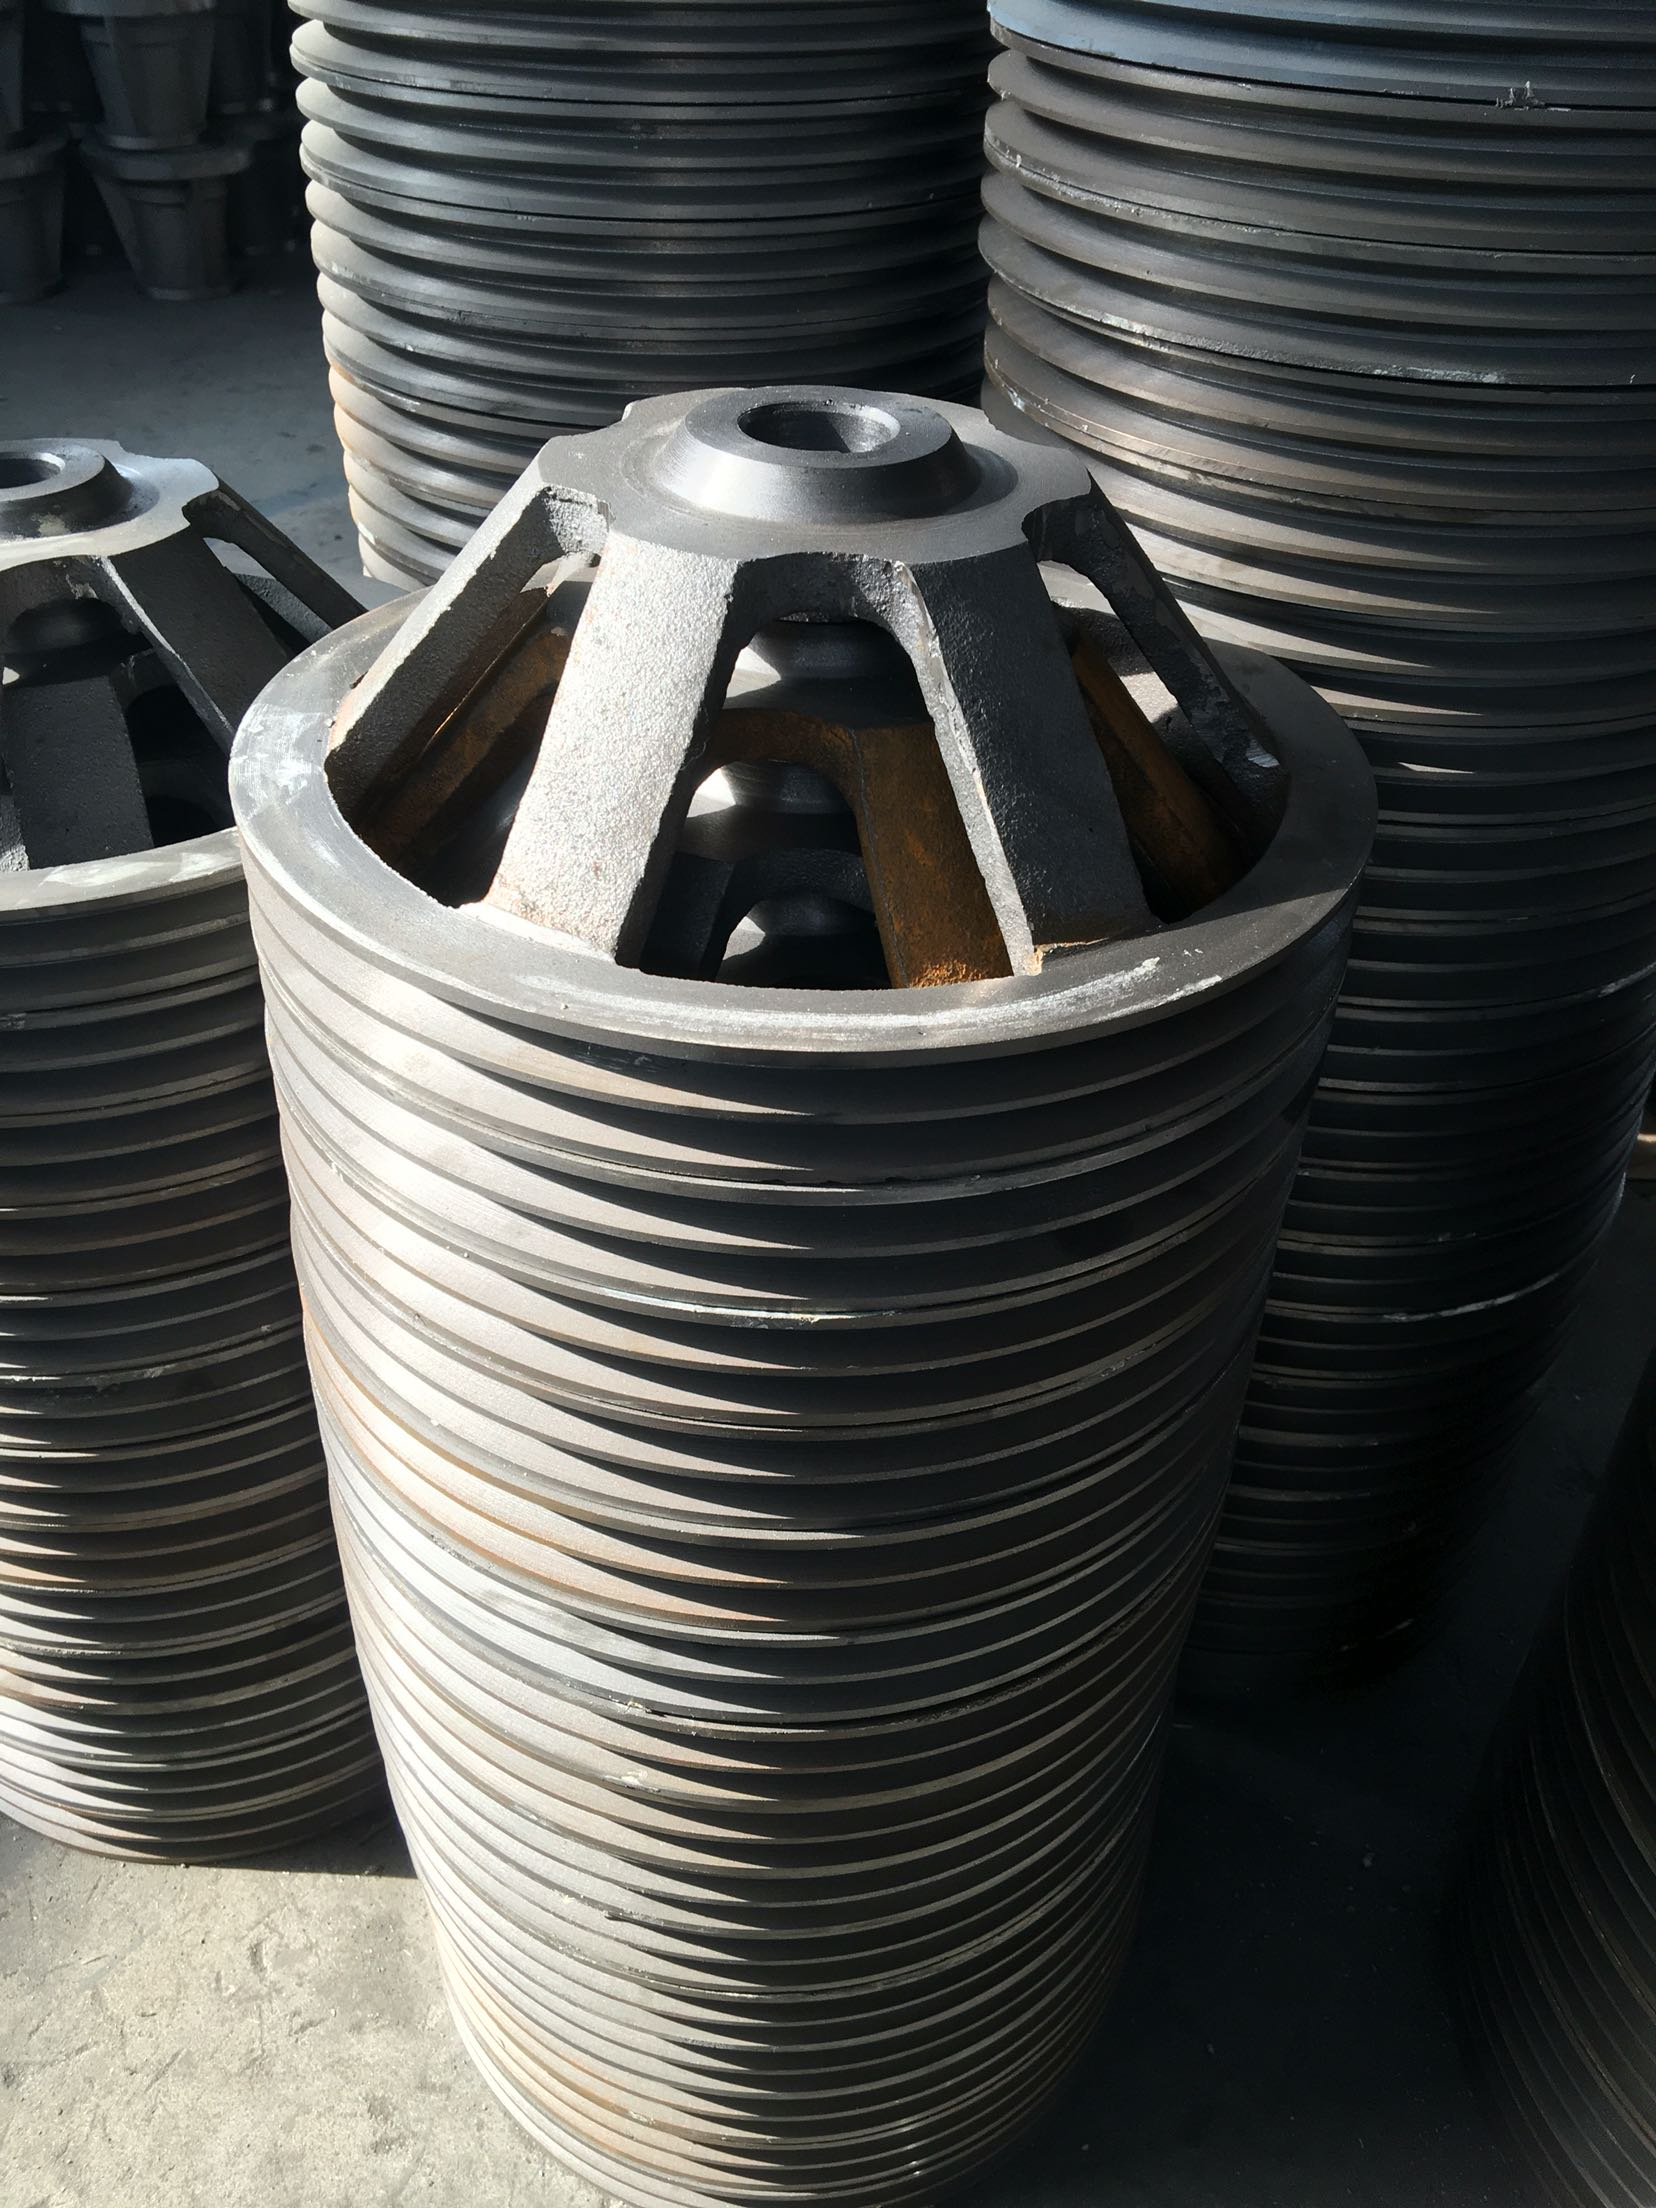 Equipamento de lavagem máquina de lavar máquina de lavar POLIA de diâmetro, 300, 400, 500, a - B - C groove